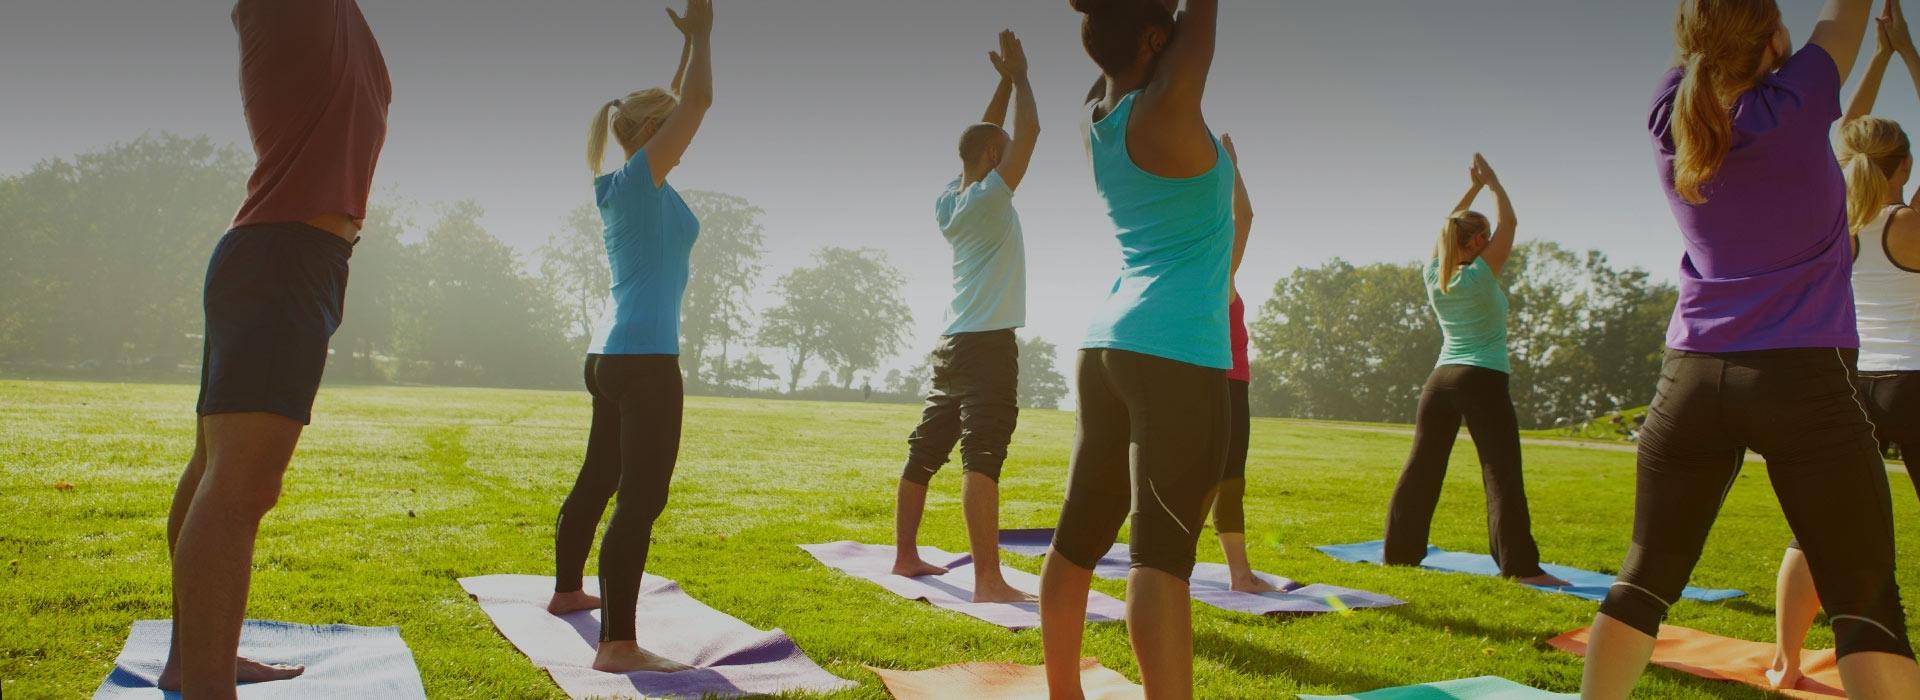 Shine Yoga & Wellness | Events